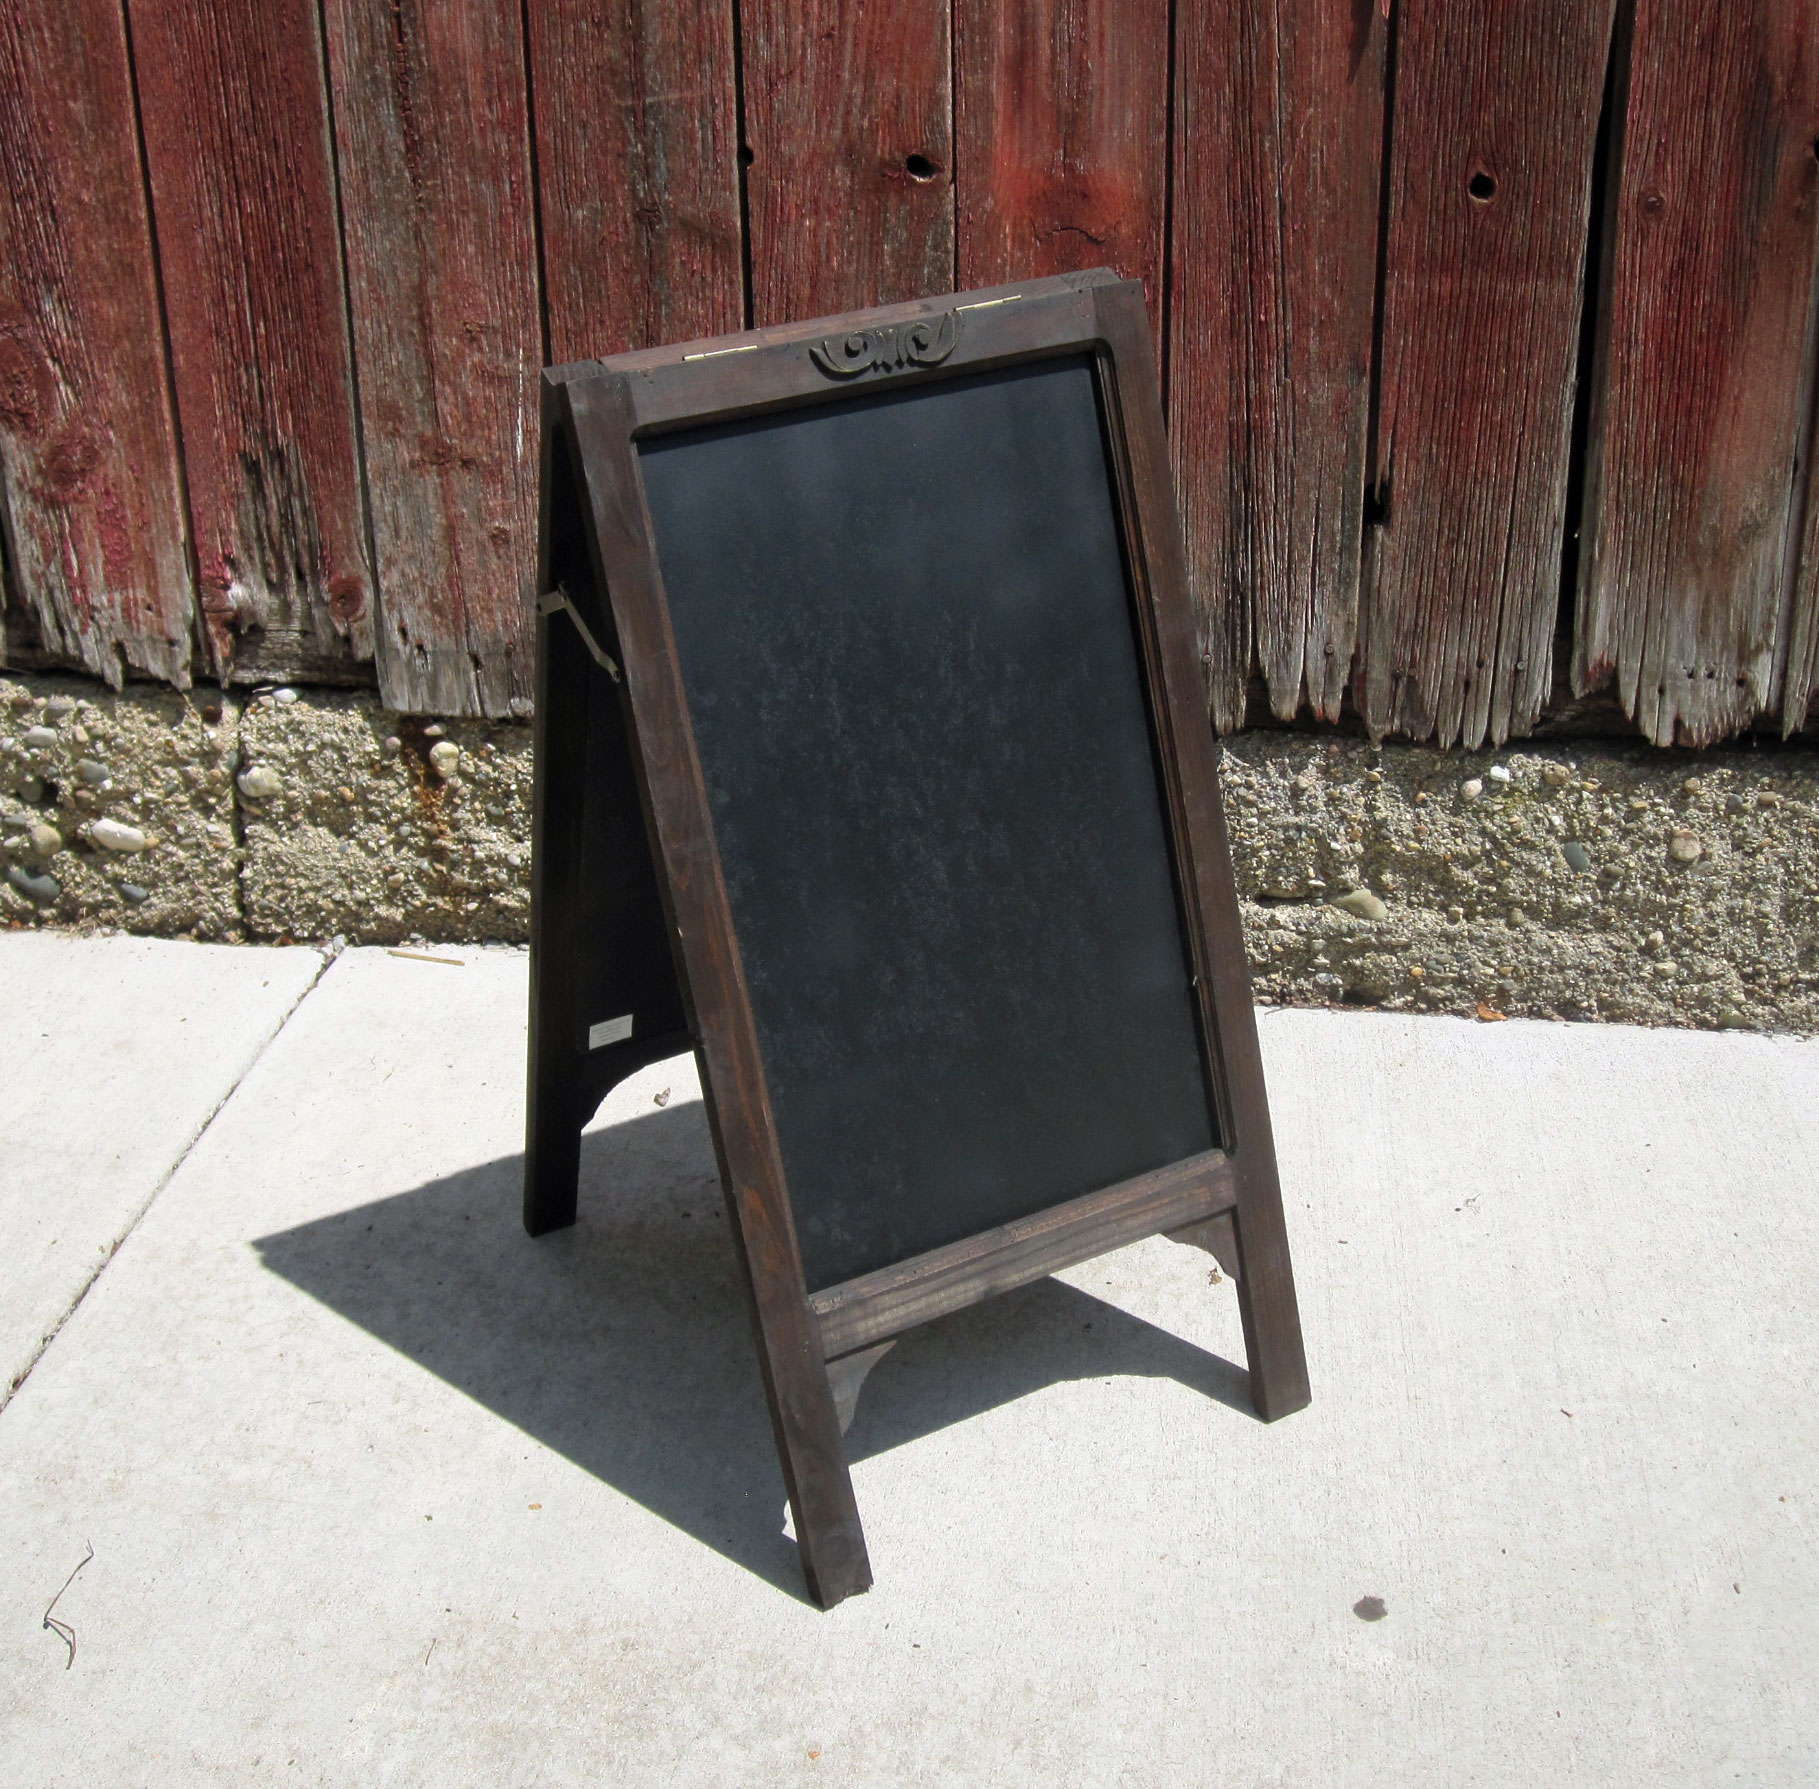 Diner Style Chalkboard - DescriptionQuantity ~1Price ~ $15